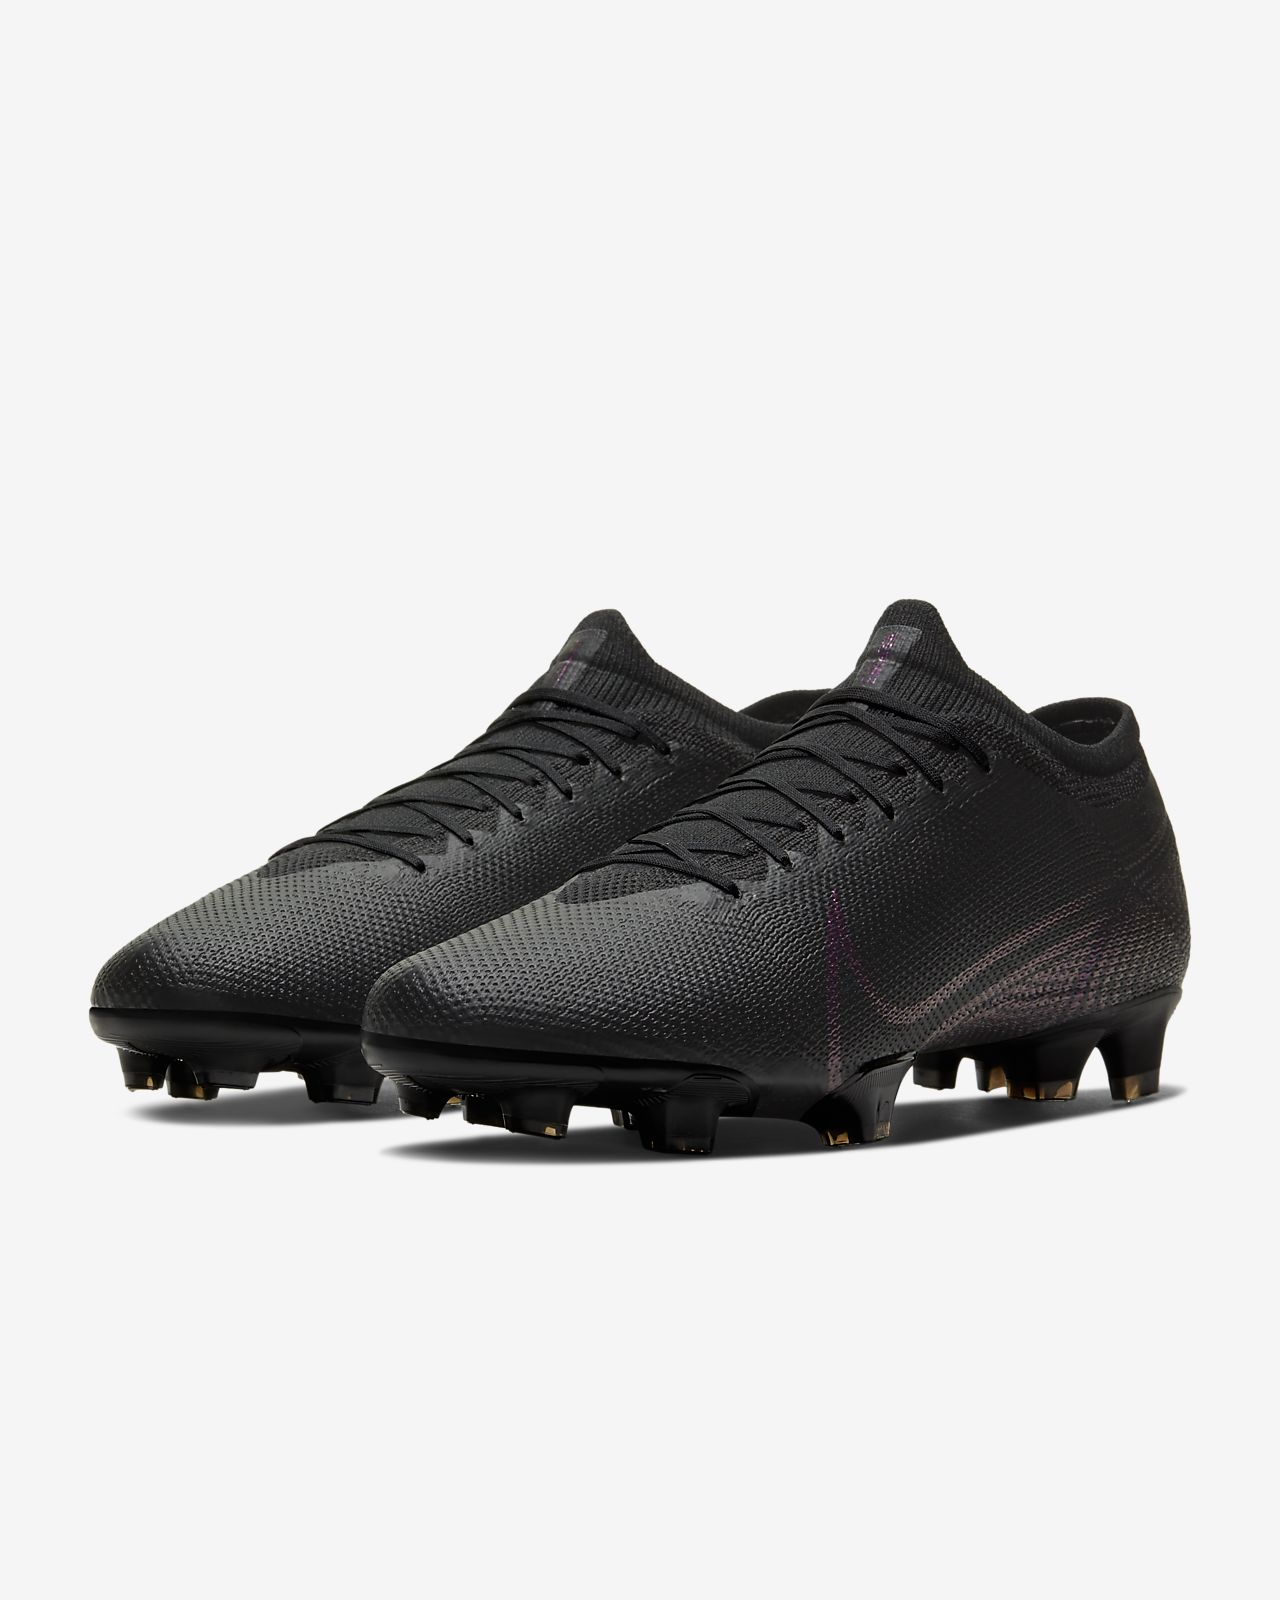 Nike Mercurial Vapor 13 Pro FG Firm Ground Football Boot